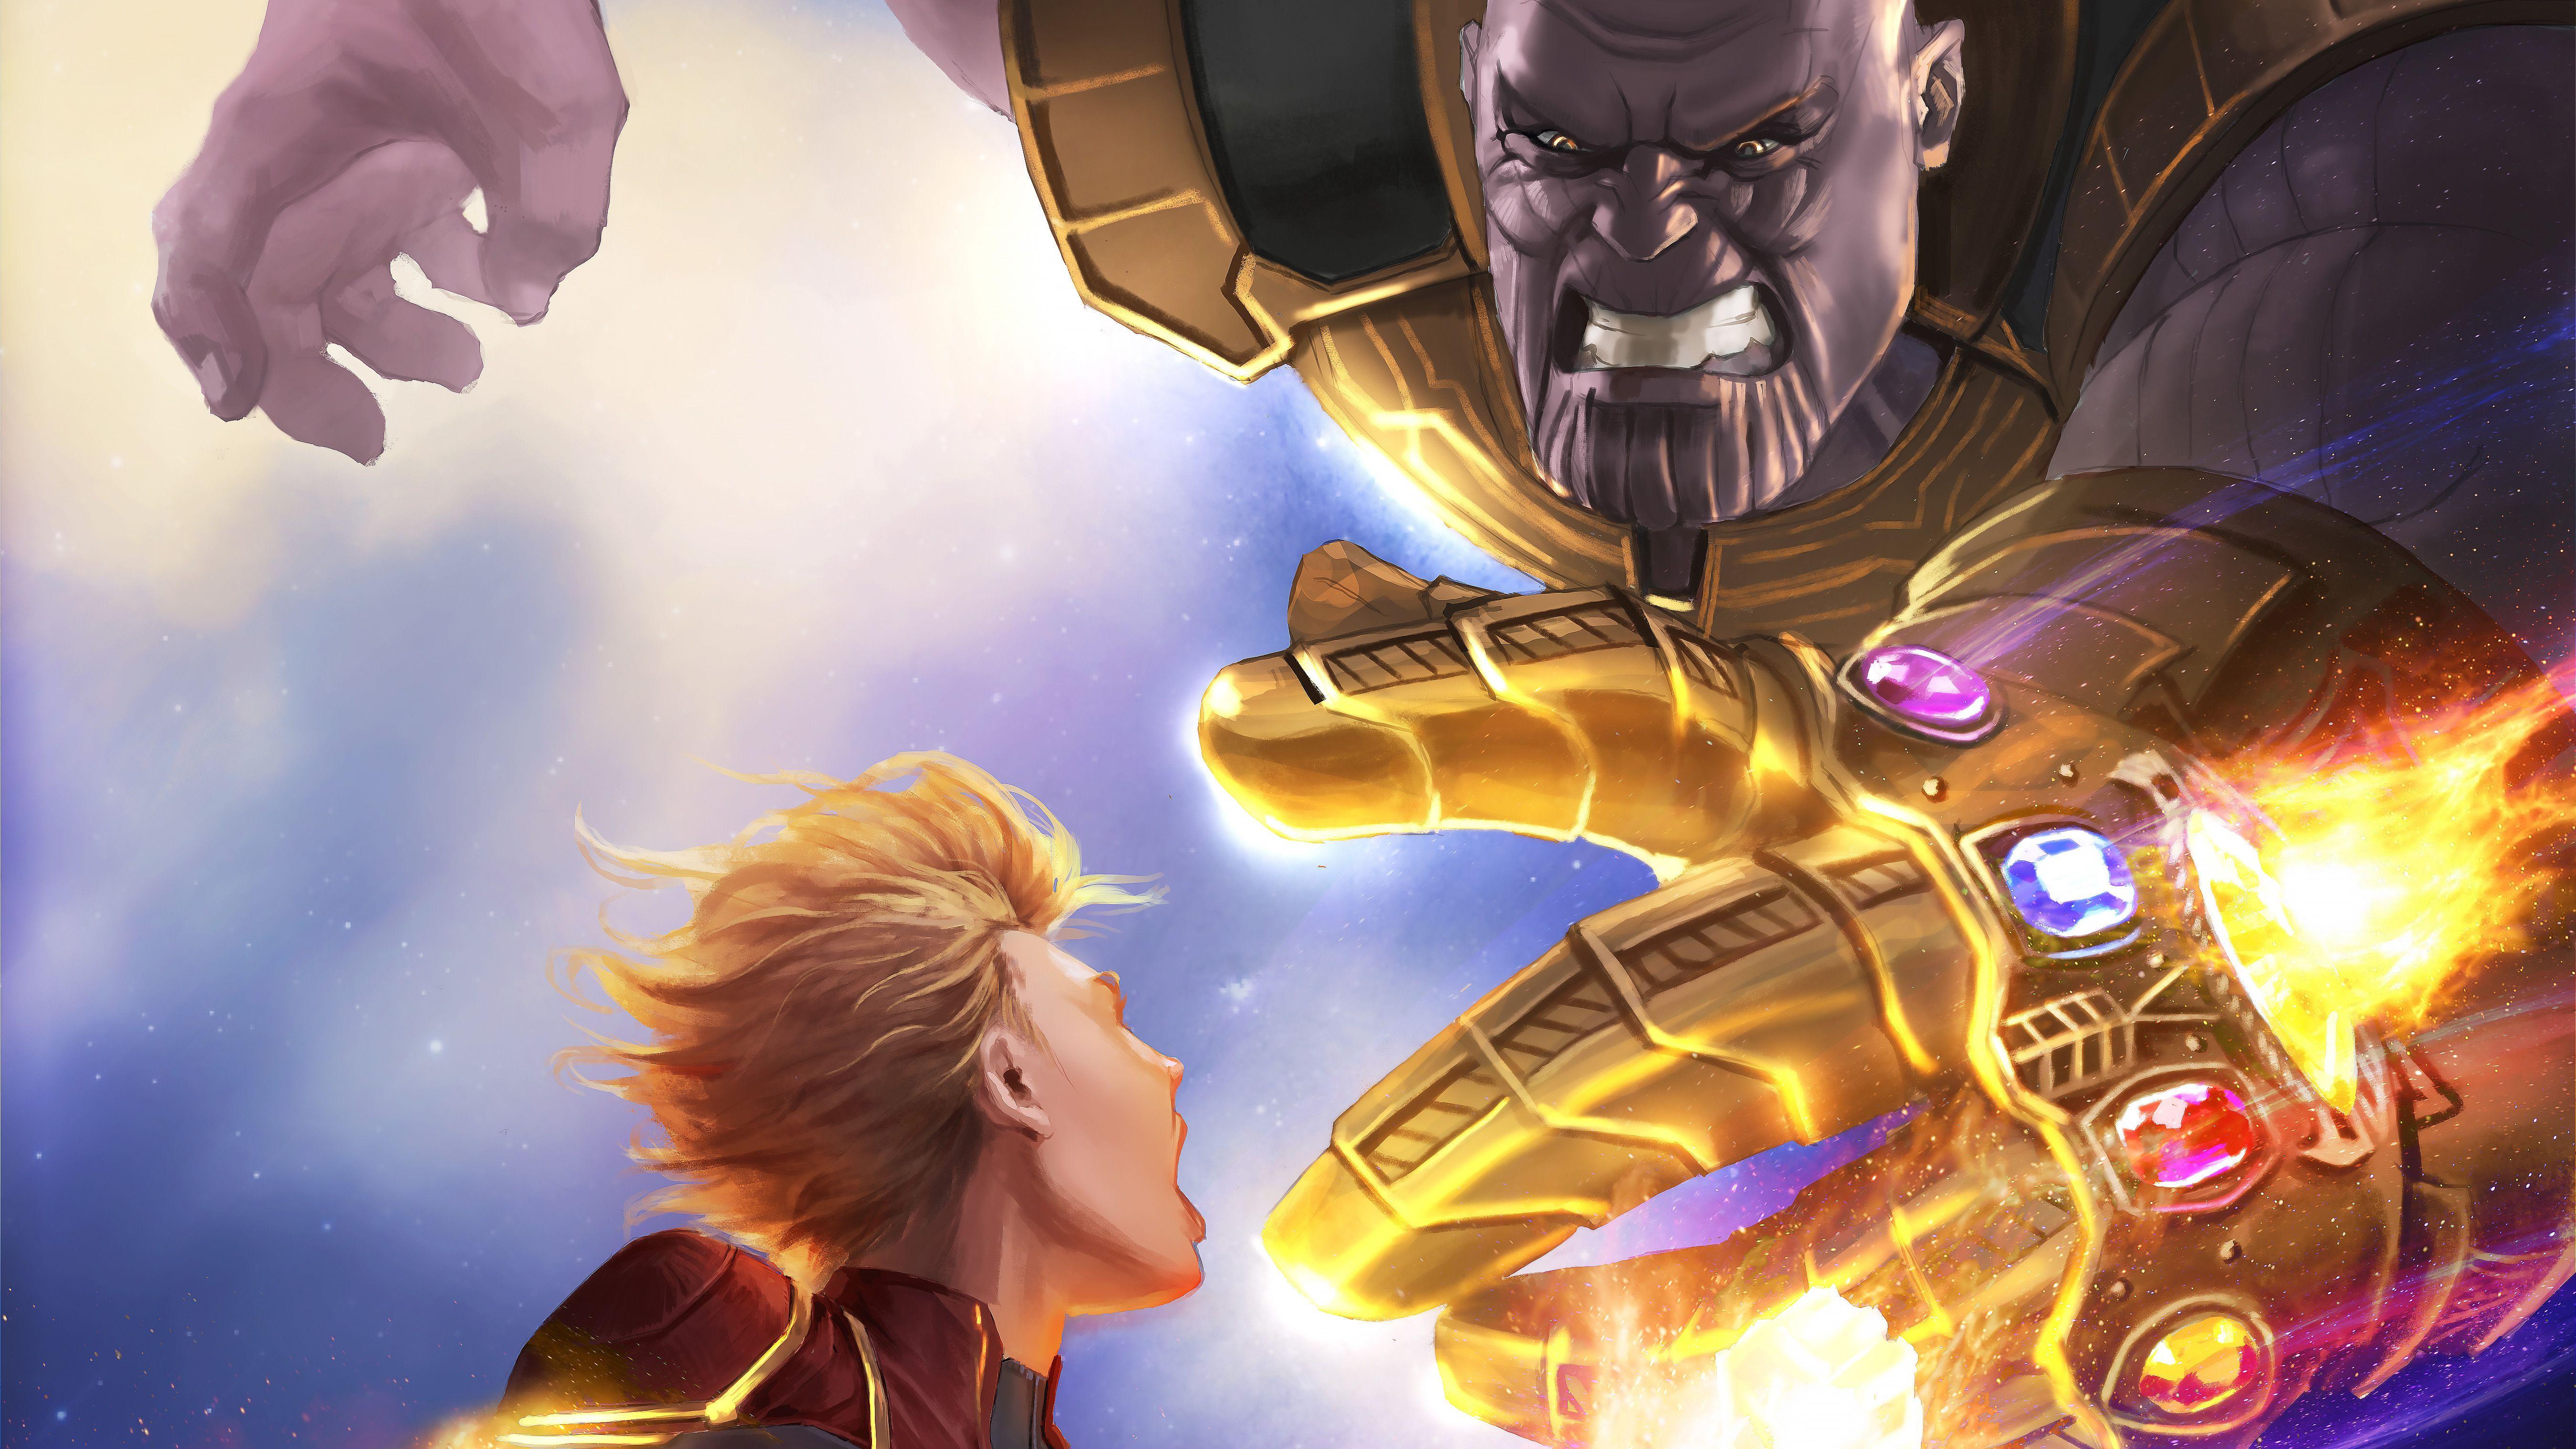 Captain Marvel Vs Thanos 5k Artwork Thanos Wallpapers Superheroes Wallpapers Hd Wallpapers Digital Art Wallpapers Marvel Wallpaper Marvel Vs Captain Marvel